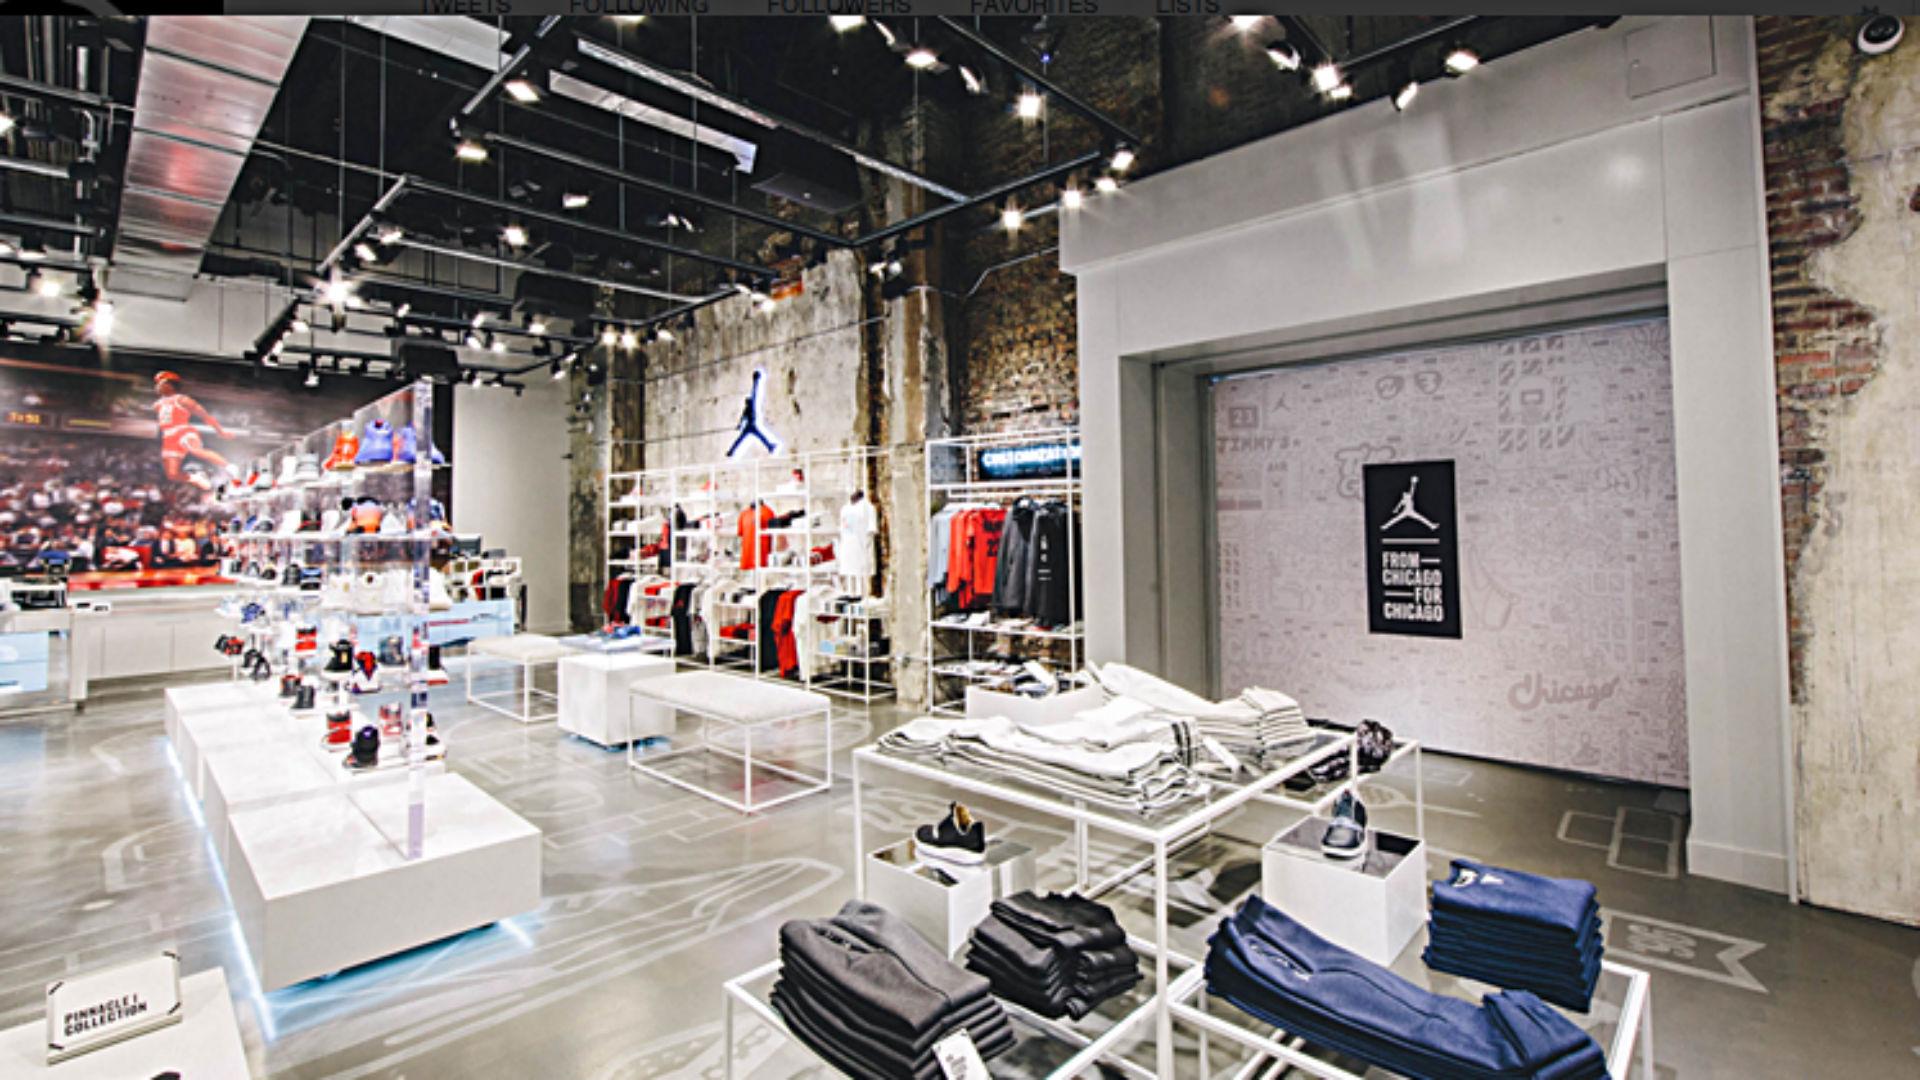 New jordan brand store opens in chicago nba sporting news for Nike jordan shop